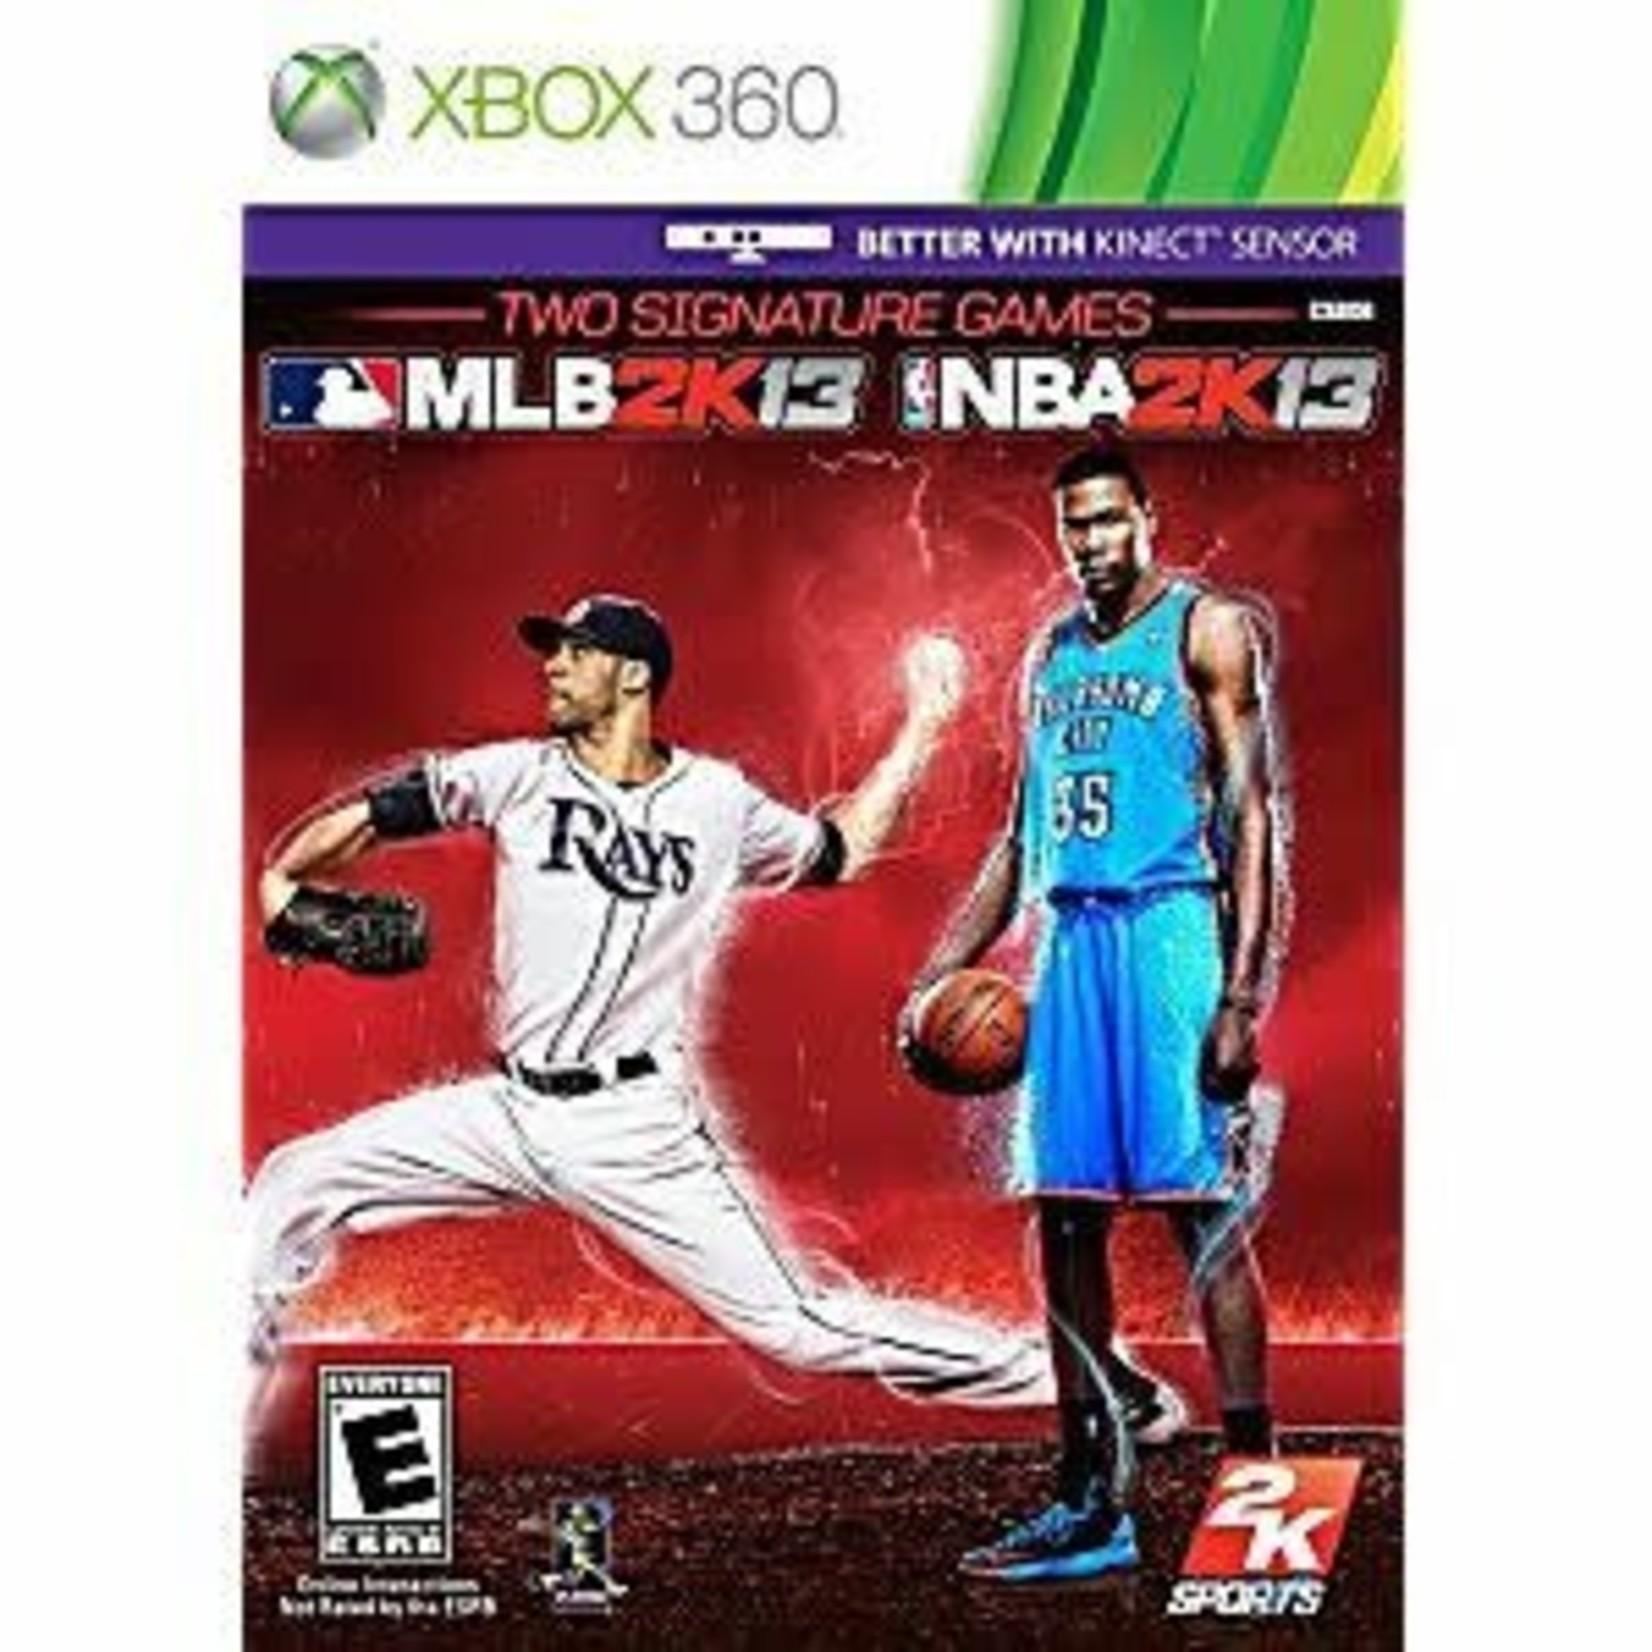 X3U-MLB 2K13 and NBA 2K13 signature games